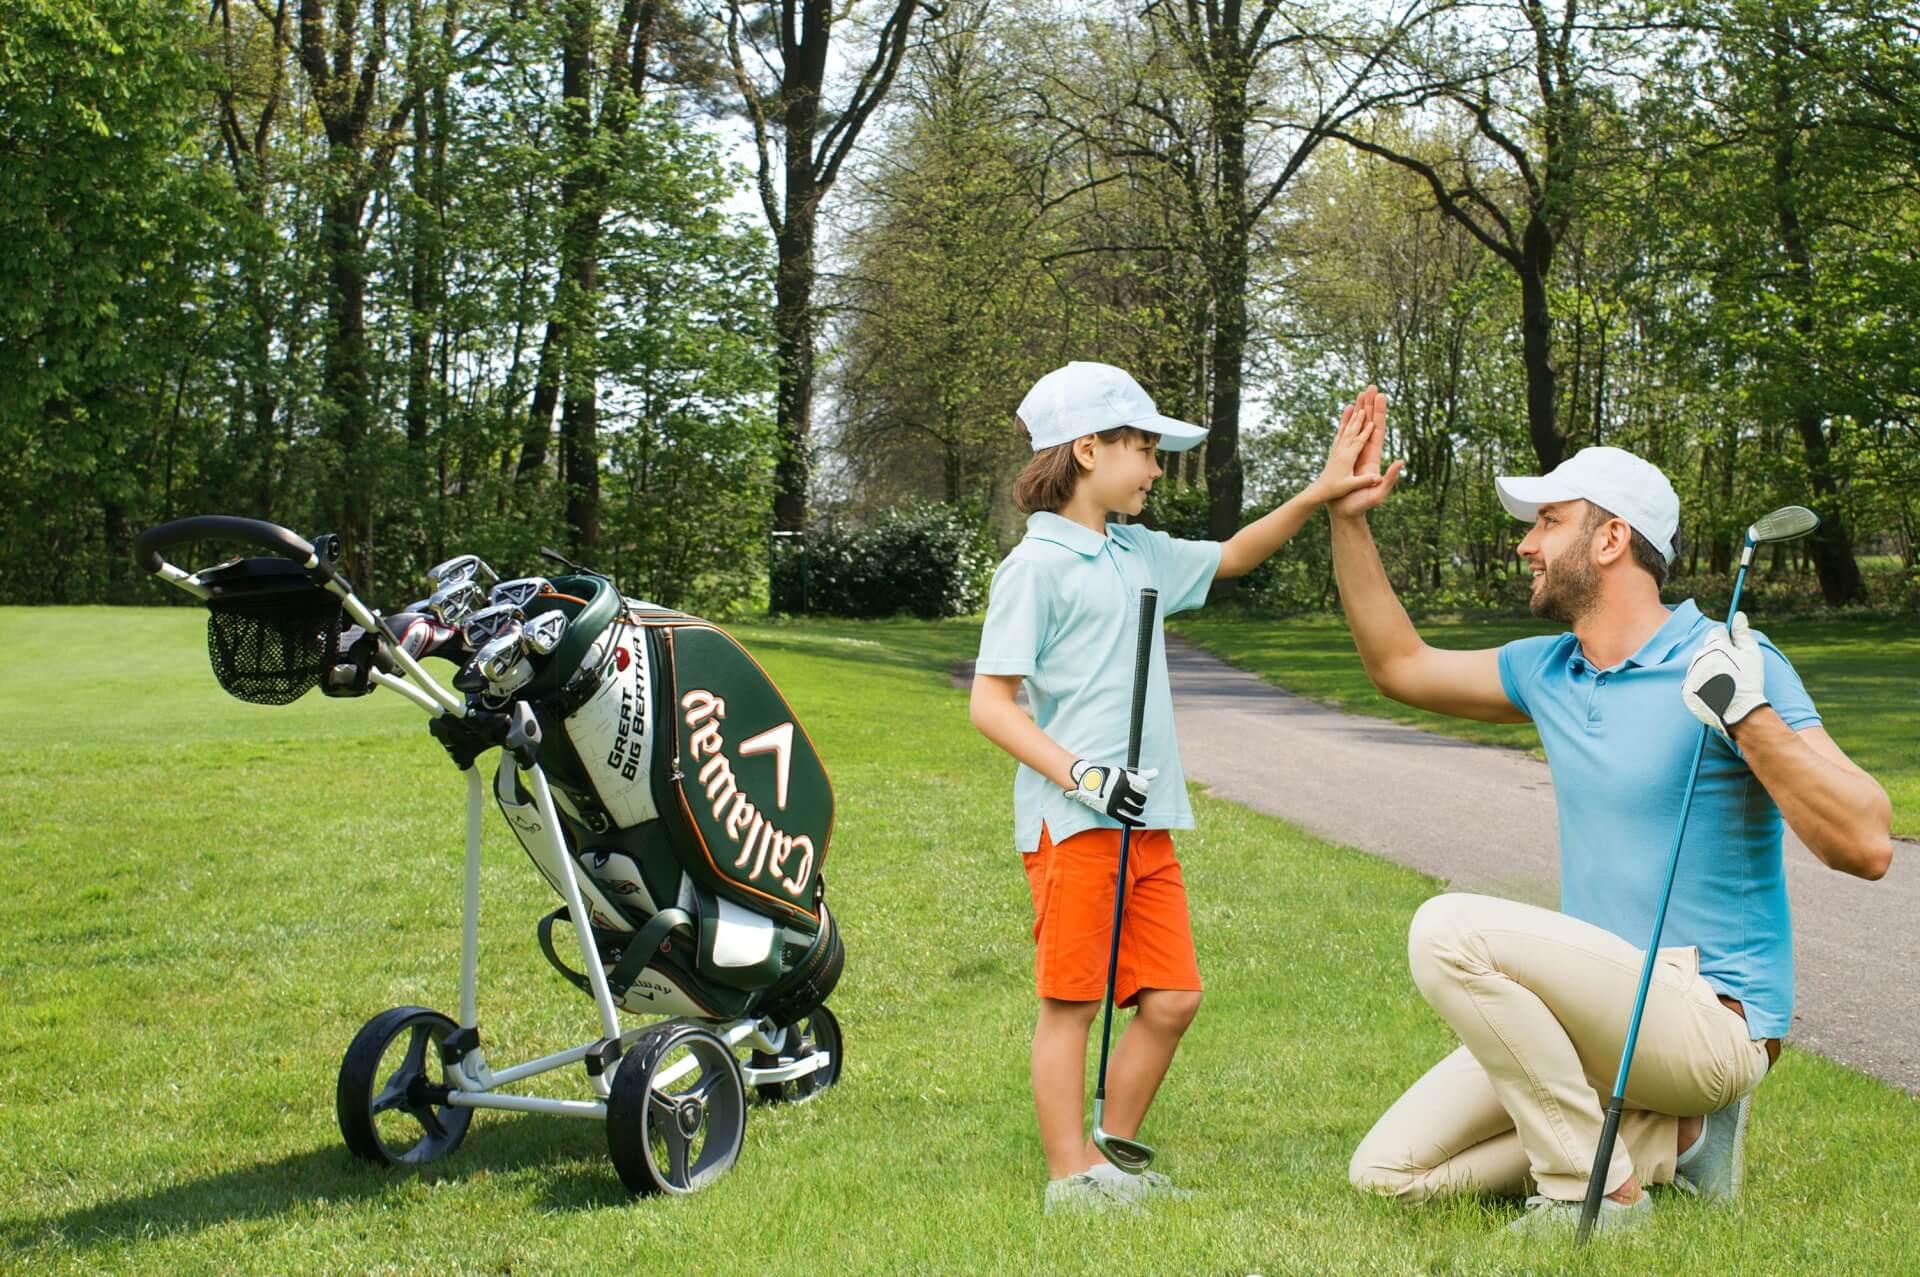 https://golfclub-peckeloh.de/wp-content/uploads/2018/03/Junge_Vater_MontagePICT0054.jpg